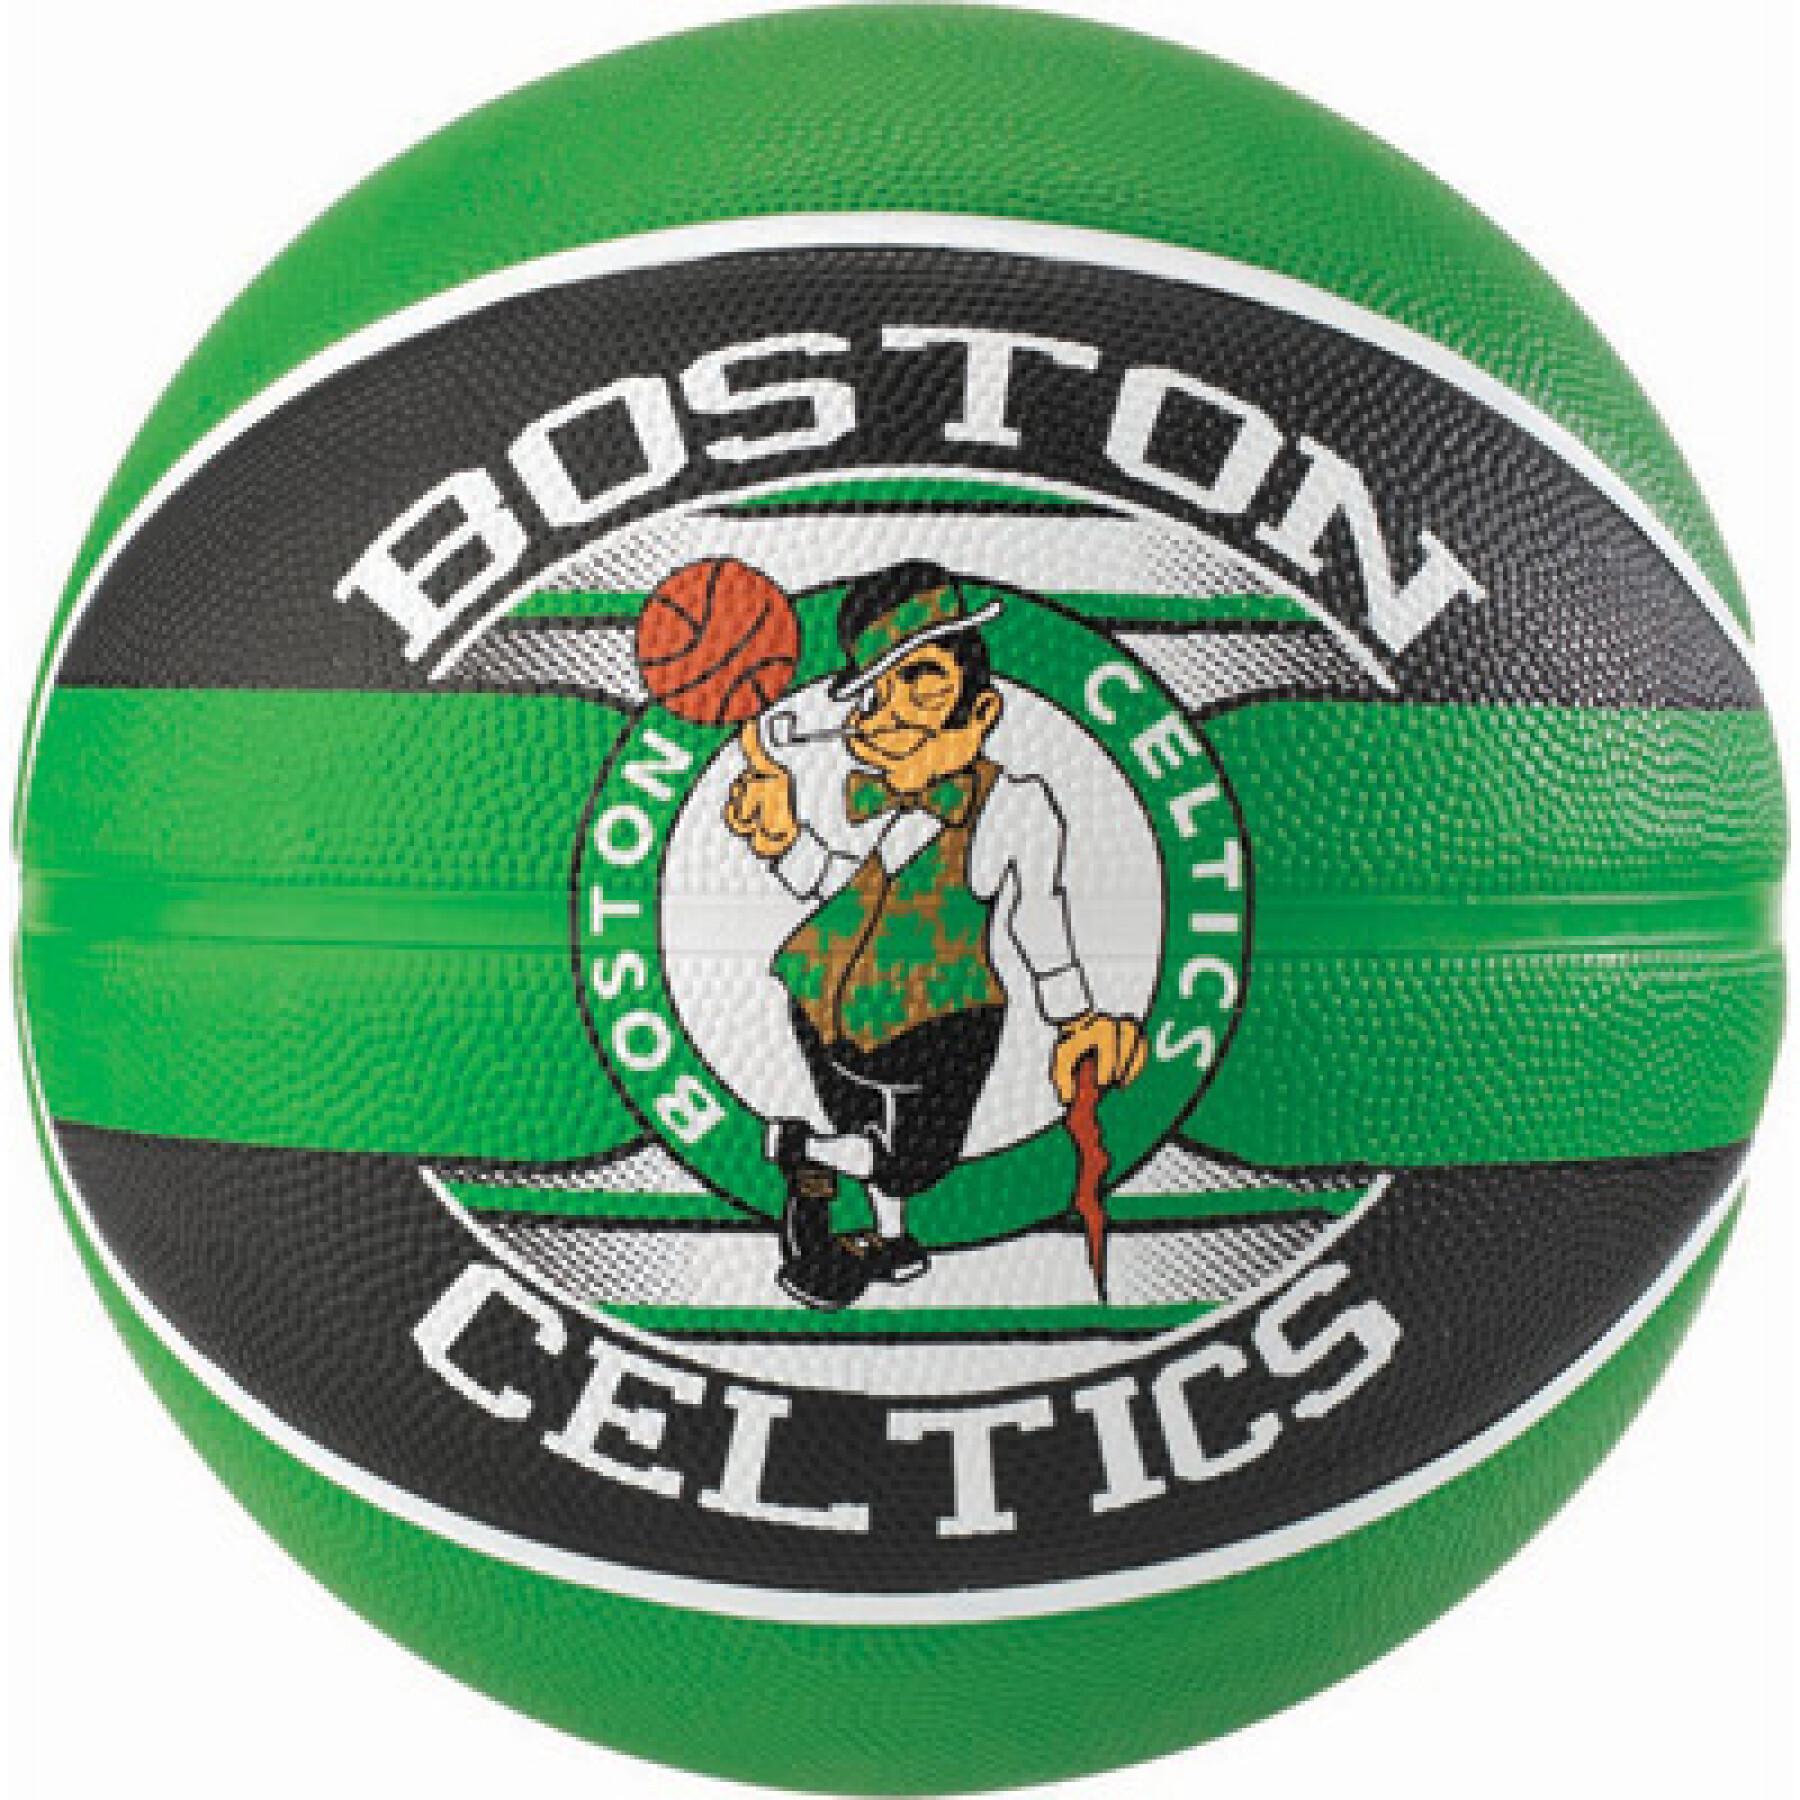 Ballon de basket Spalding  Boston Celtics